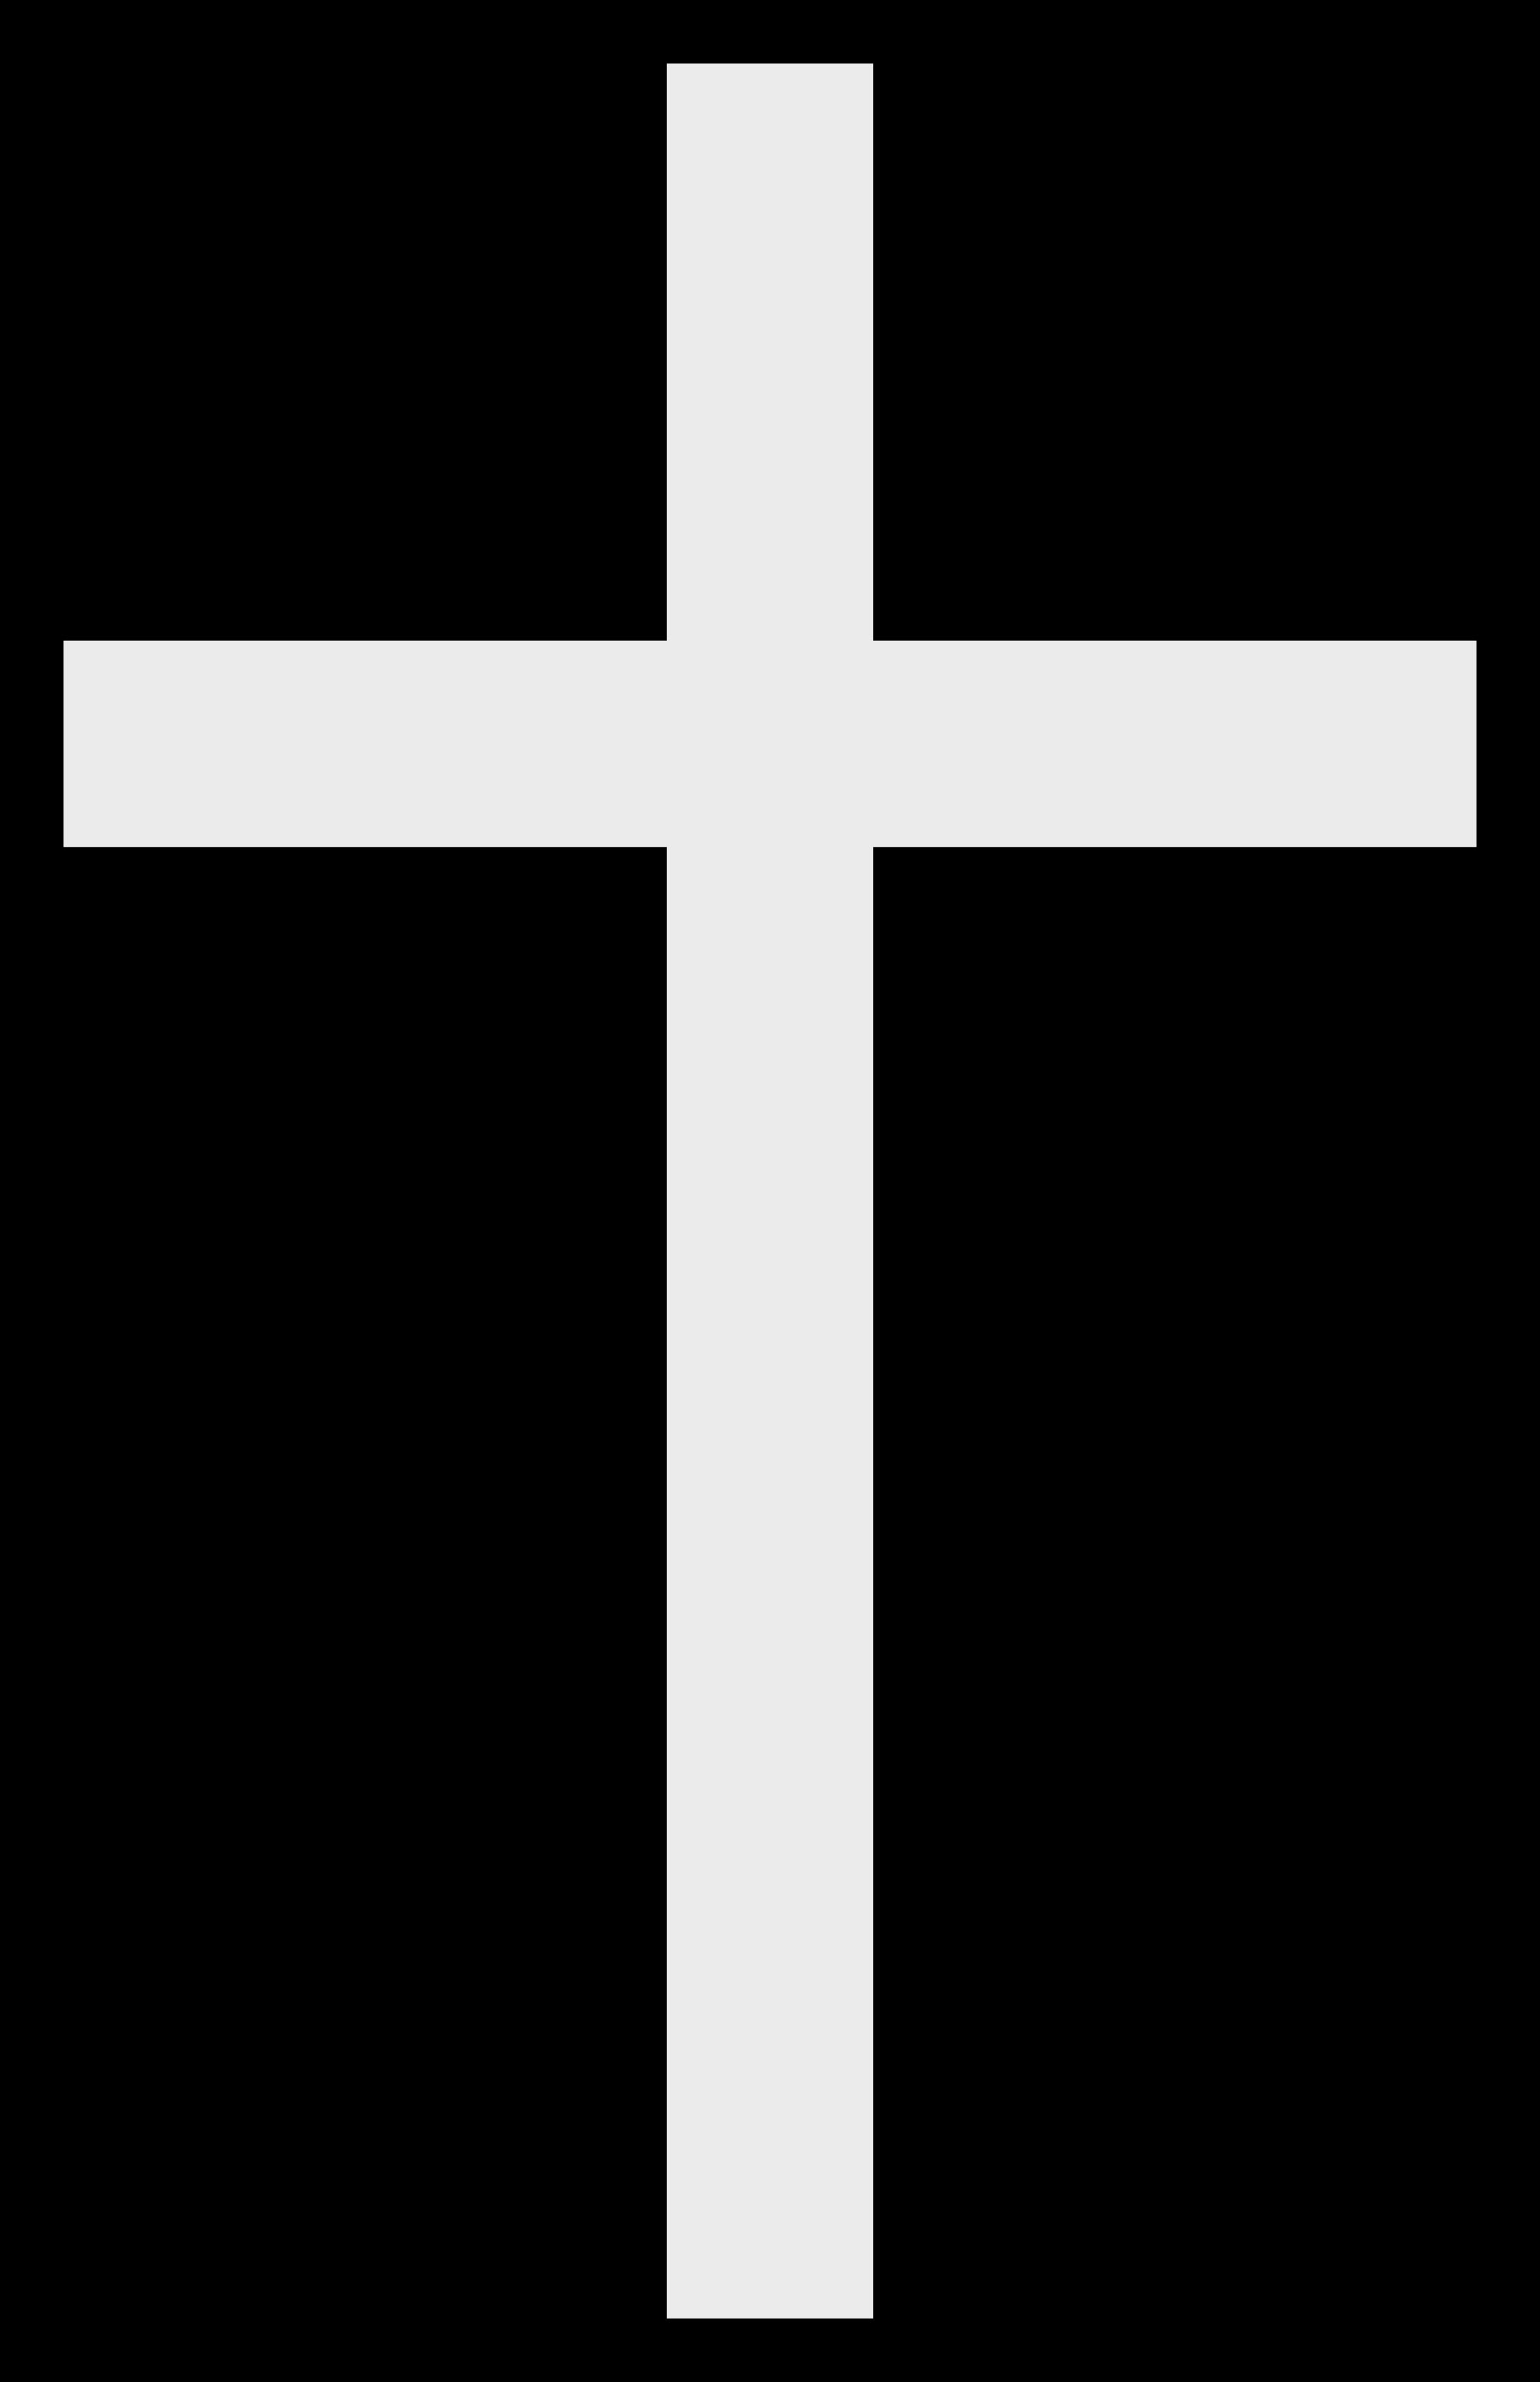 cross svg  download cross svg clipart of jesus in glastonbury clipart of jesus on cross